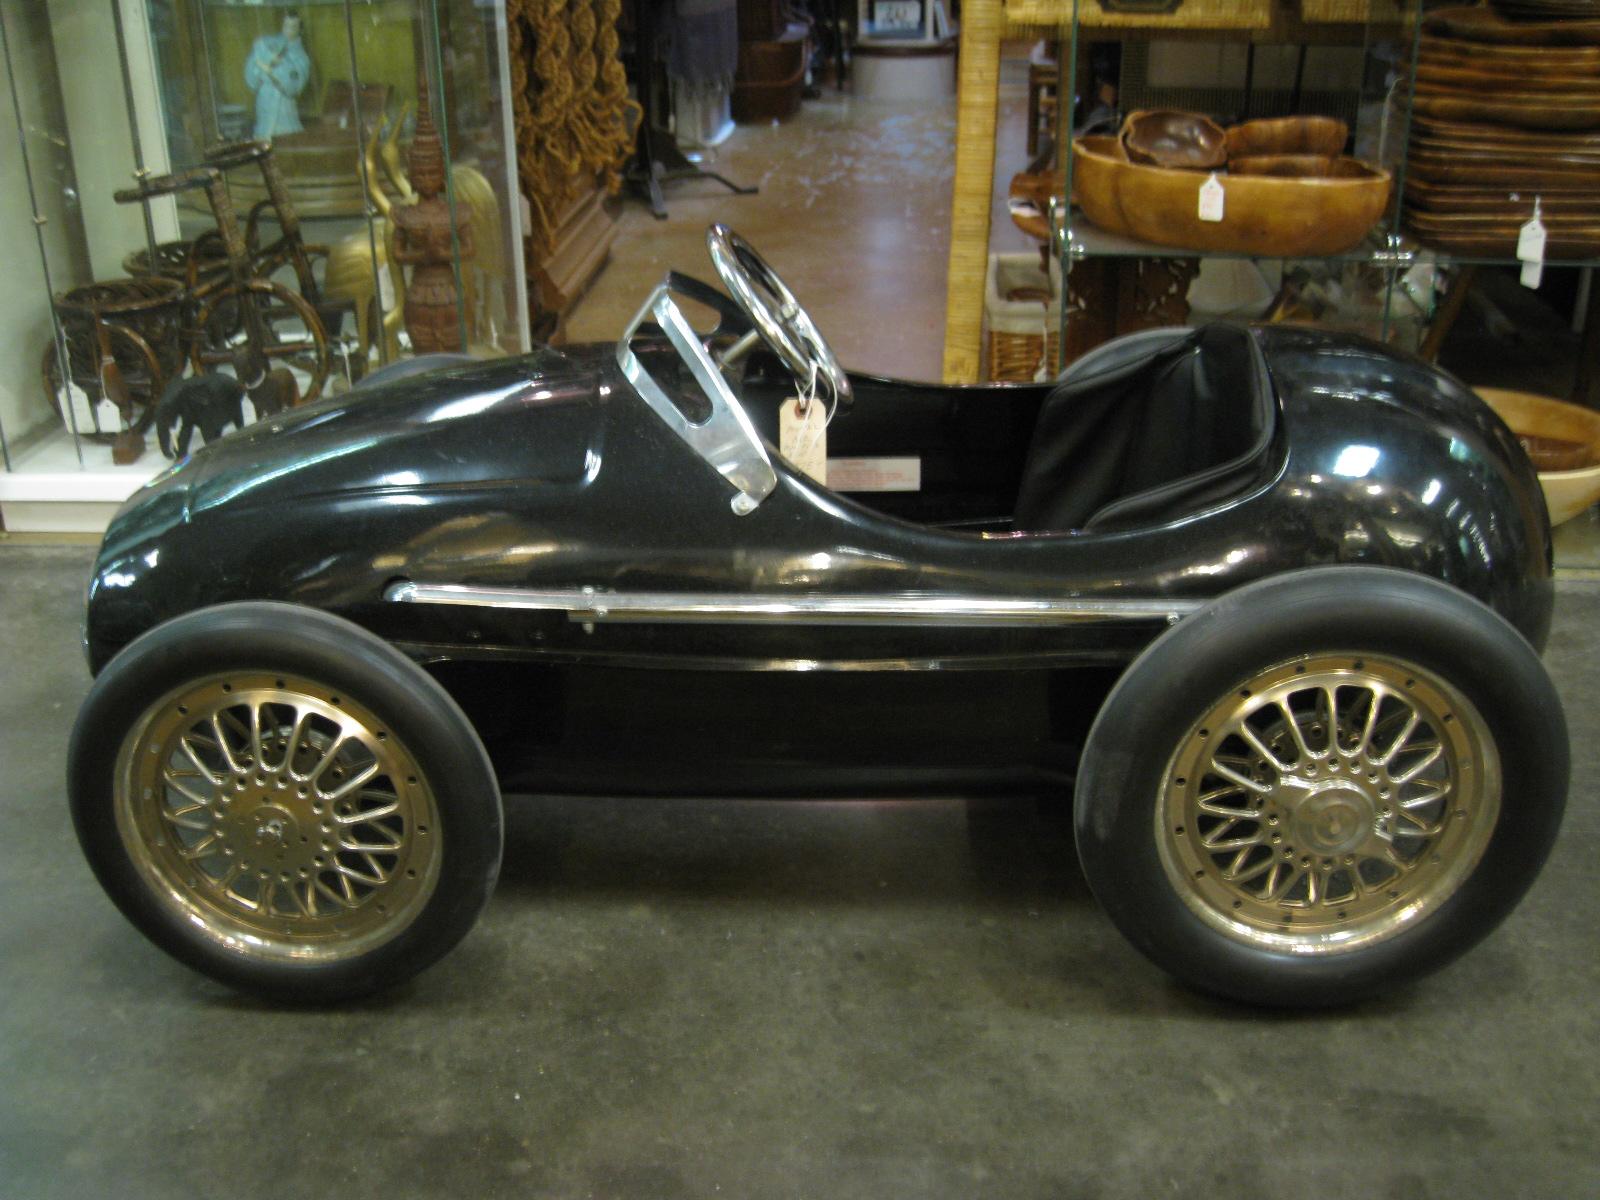 gannon 39 s antiques art alfa romeo one of a kind metal car. Black Bedroom Furniture Sets. Home Design Ideas